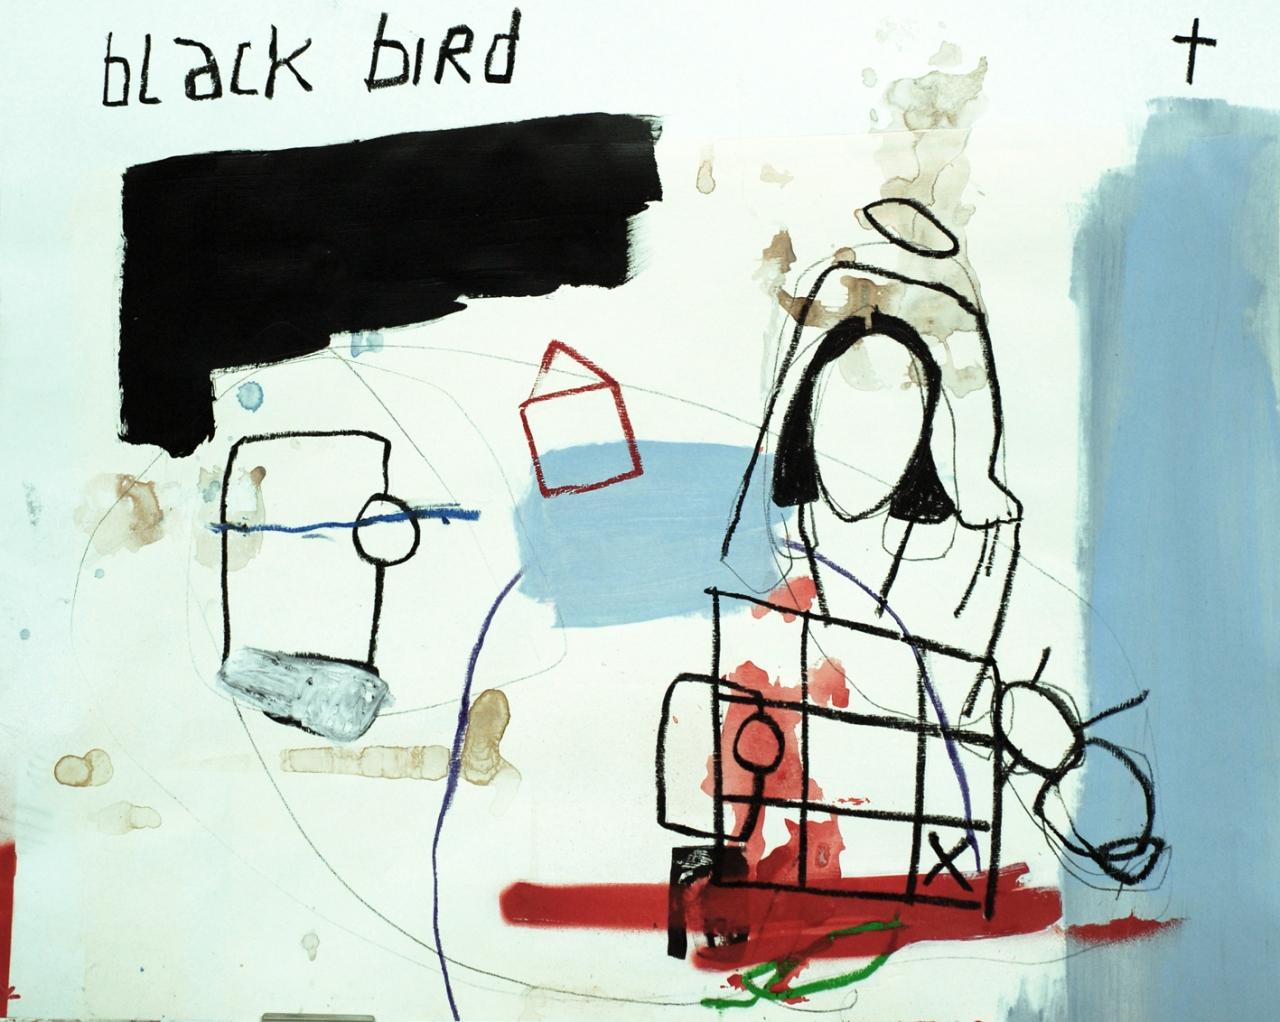 acrylic, pen, pastel on paper _ 75 x 50 cm